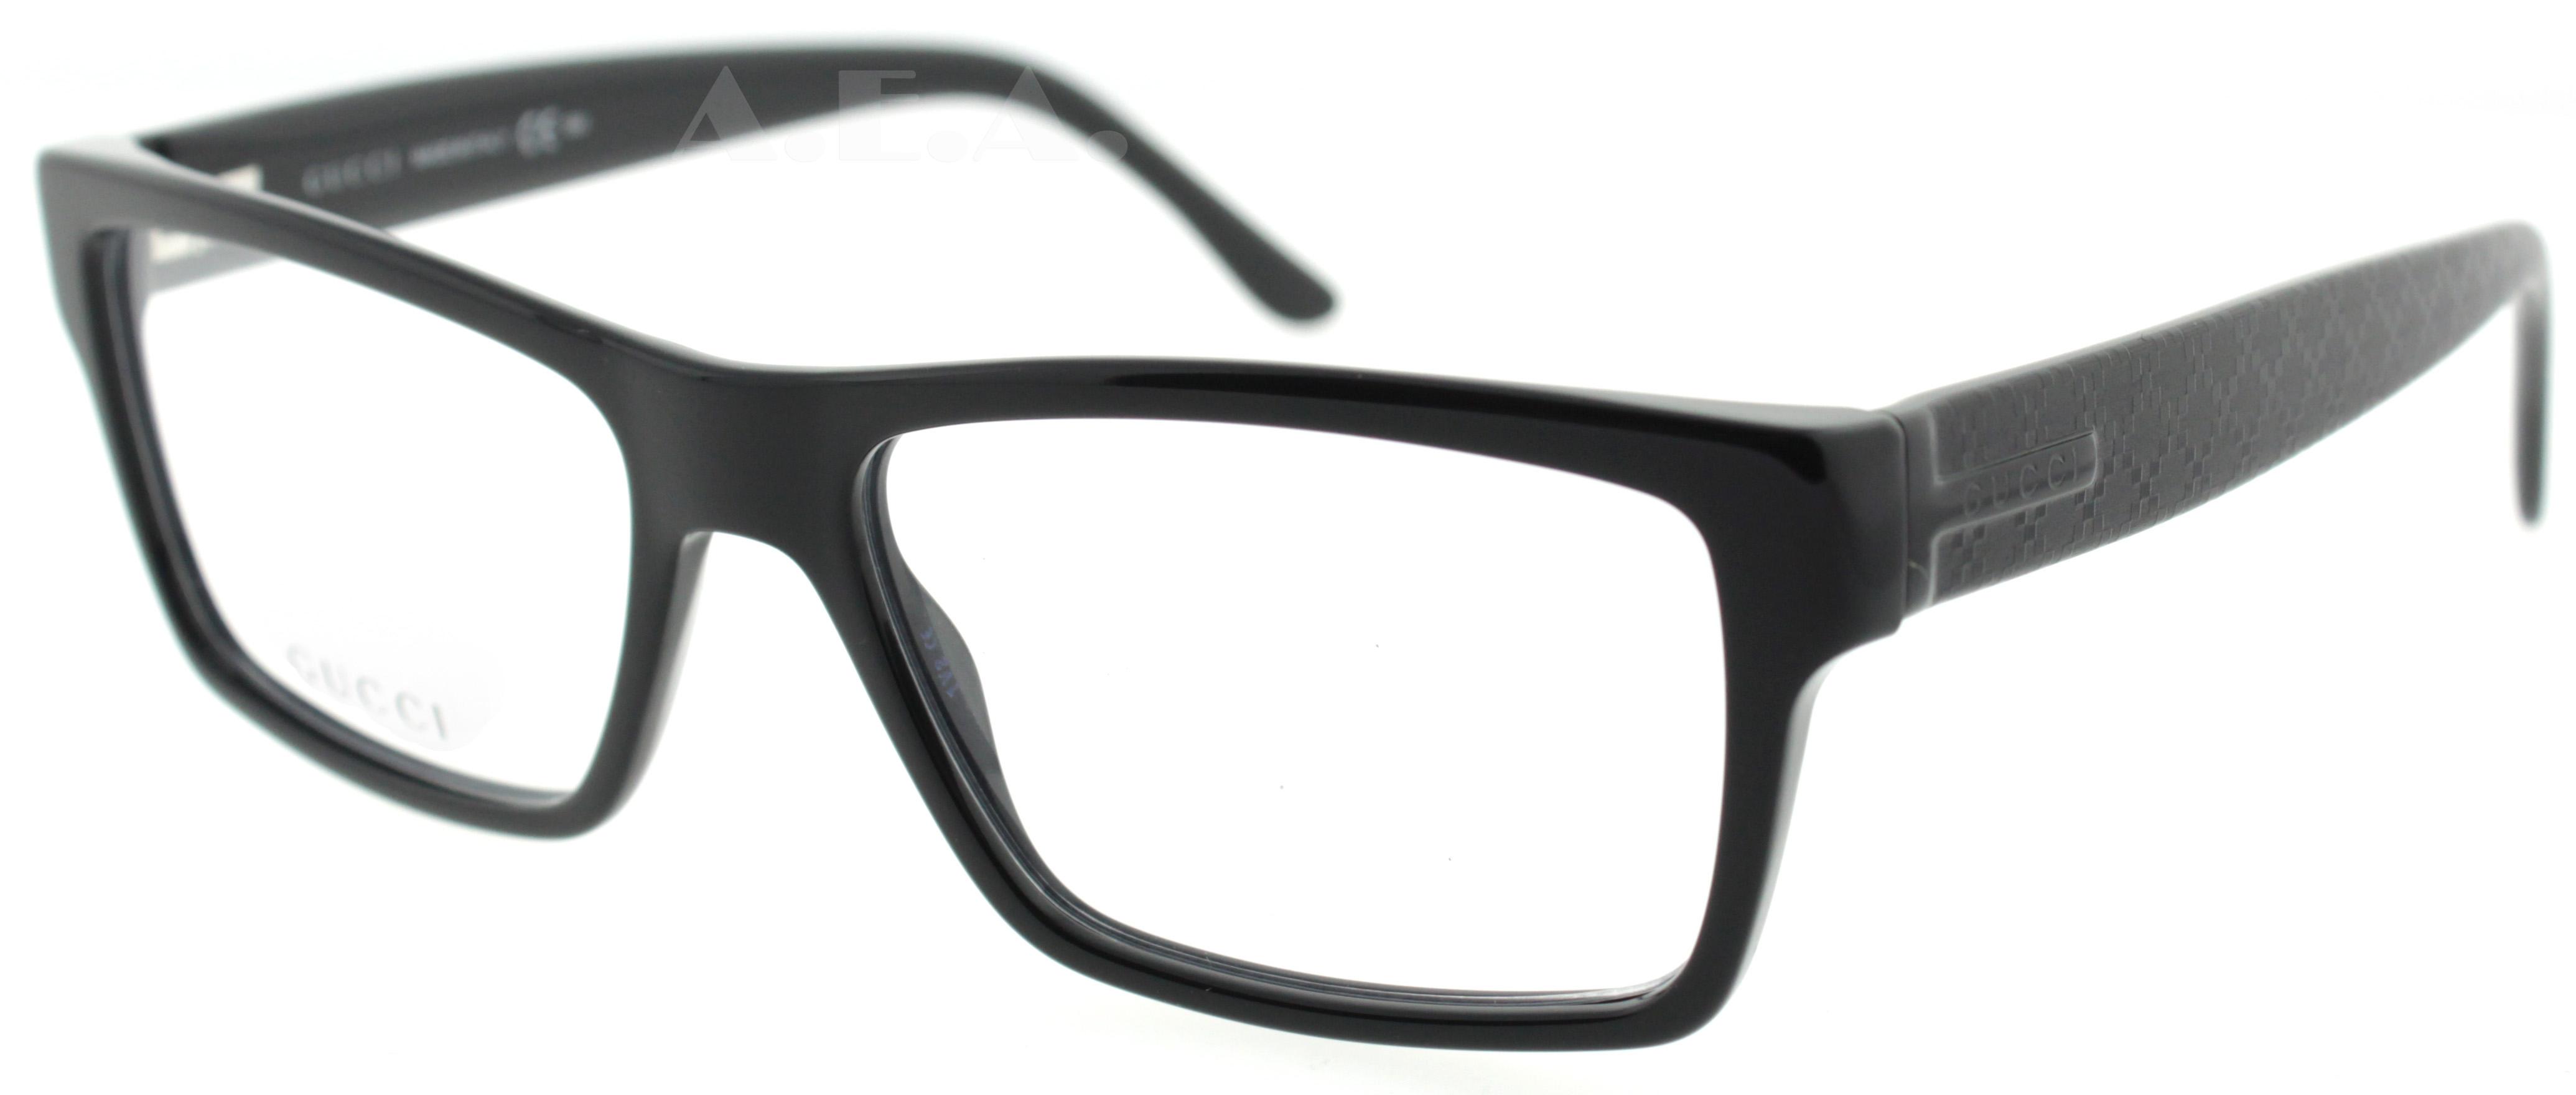 Gucci Frames For Mens Glasses : Gucci GG 1022 Black 807 Gg1022 MenS Eyeglasses eBay